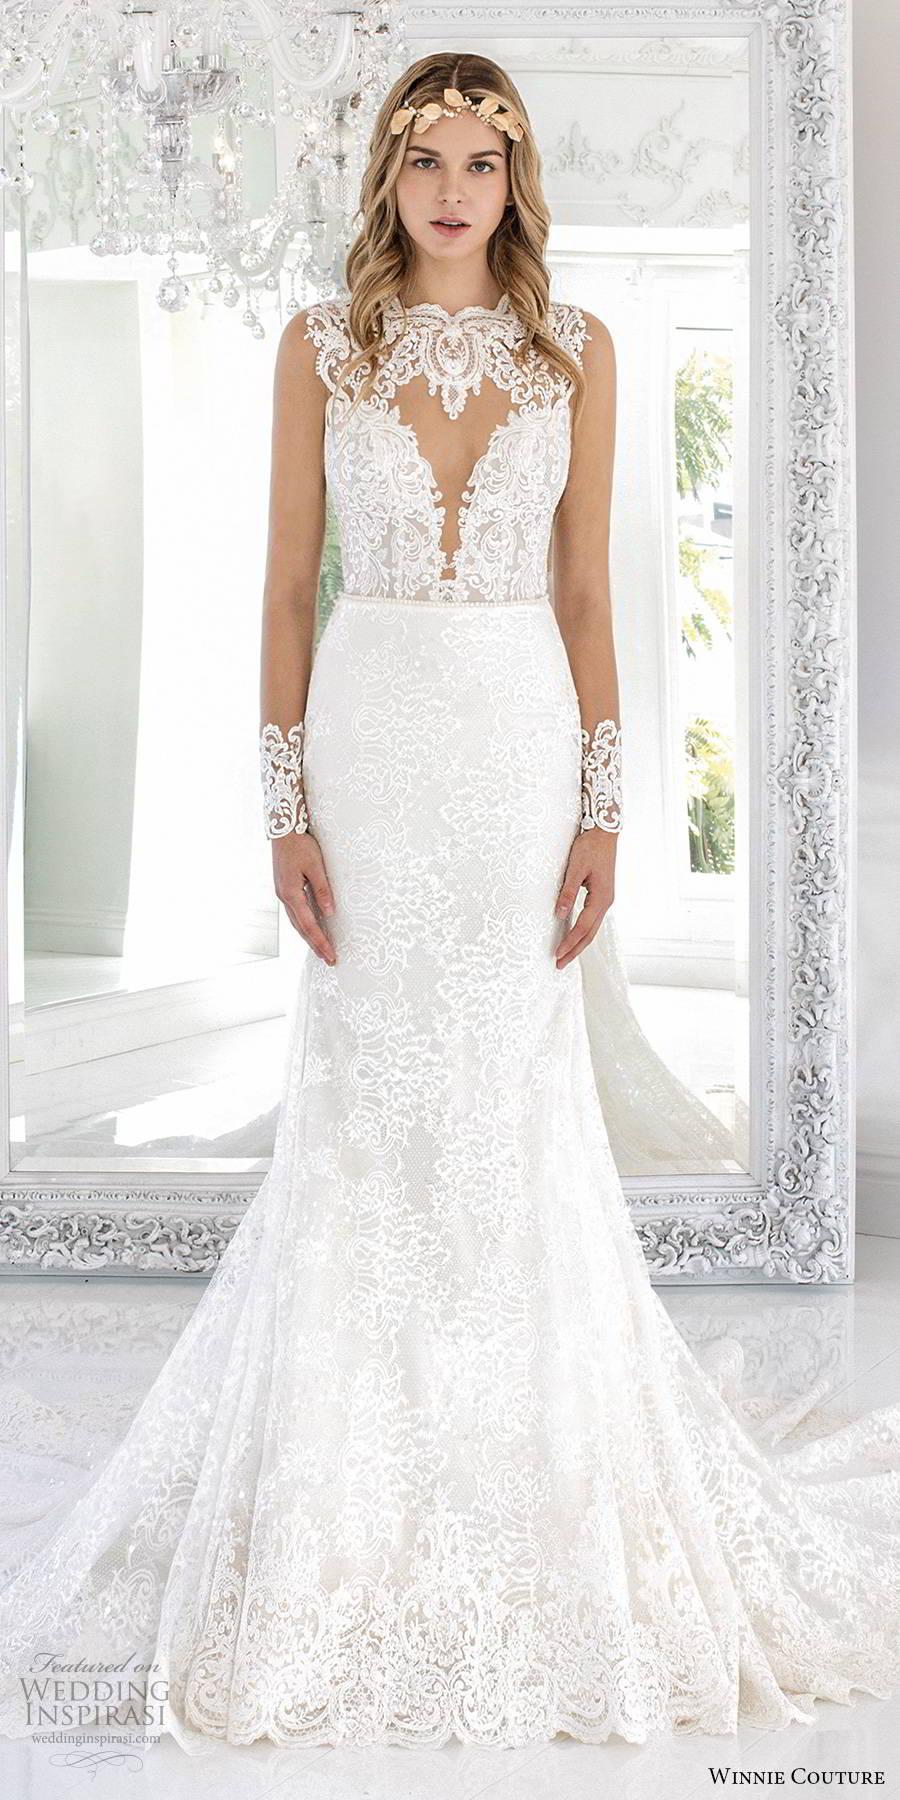 winnie couture 2019 bridal illusion long sleeves jewel necklne cutout bodice fully embellished lace elegant fit flare mermaid wedding dress sheer back chapel train (1) mv